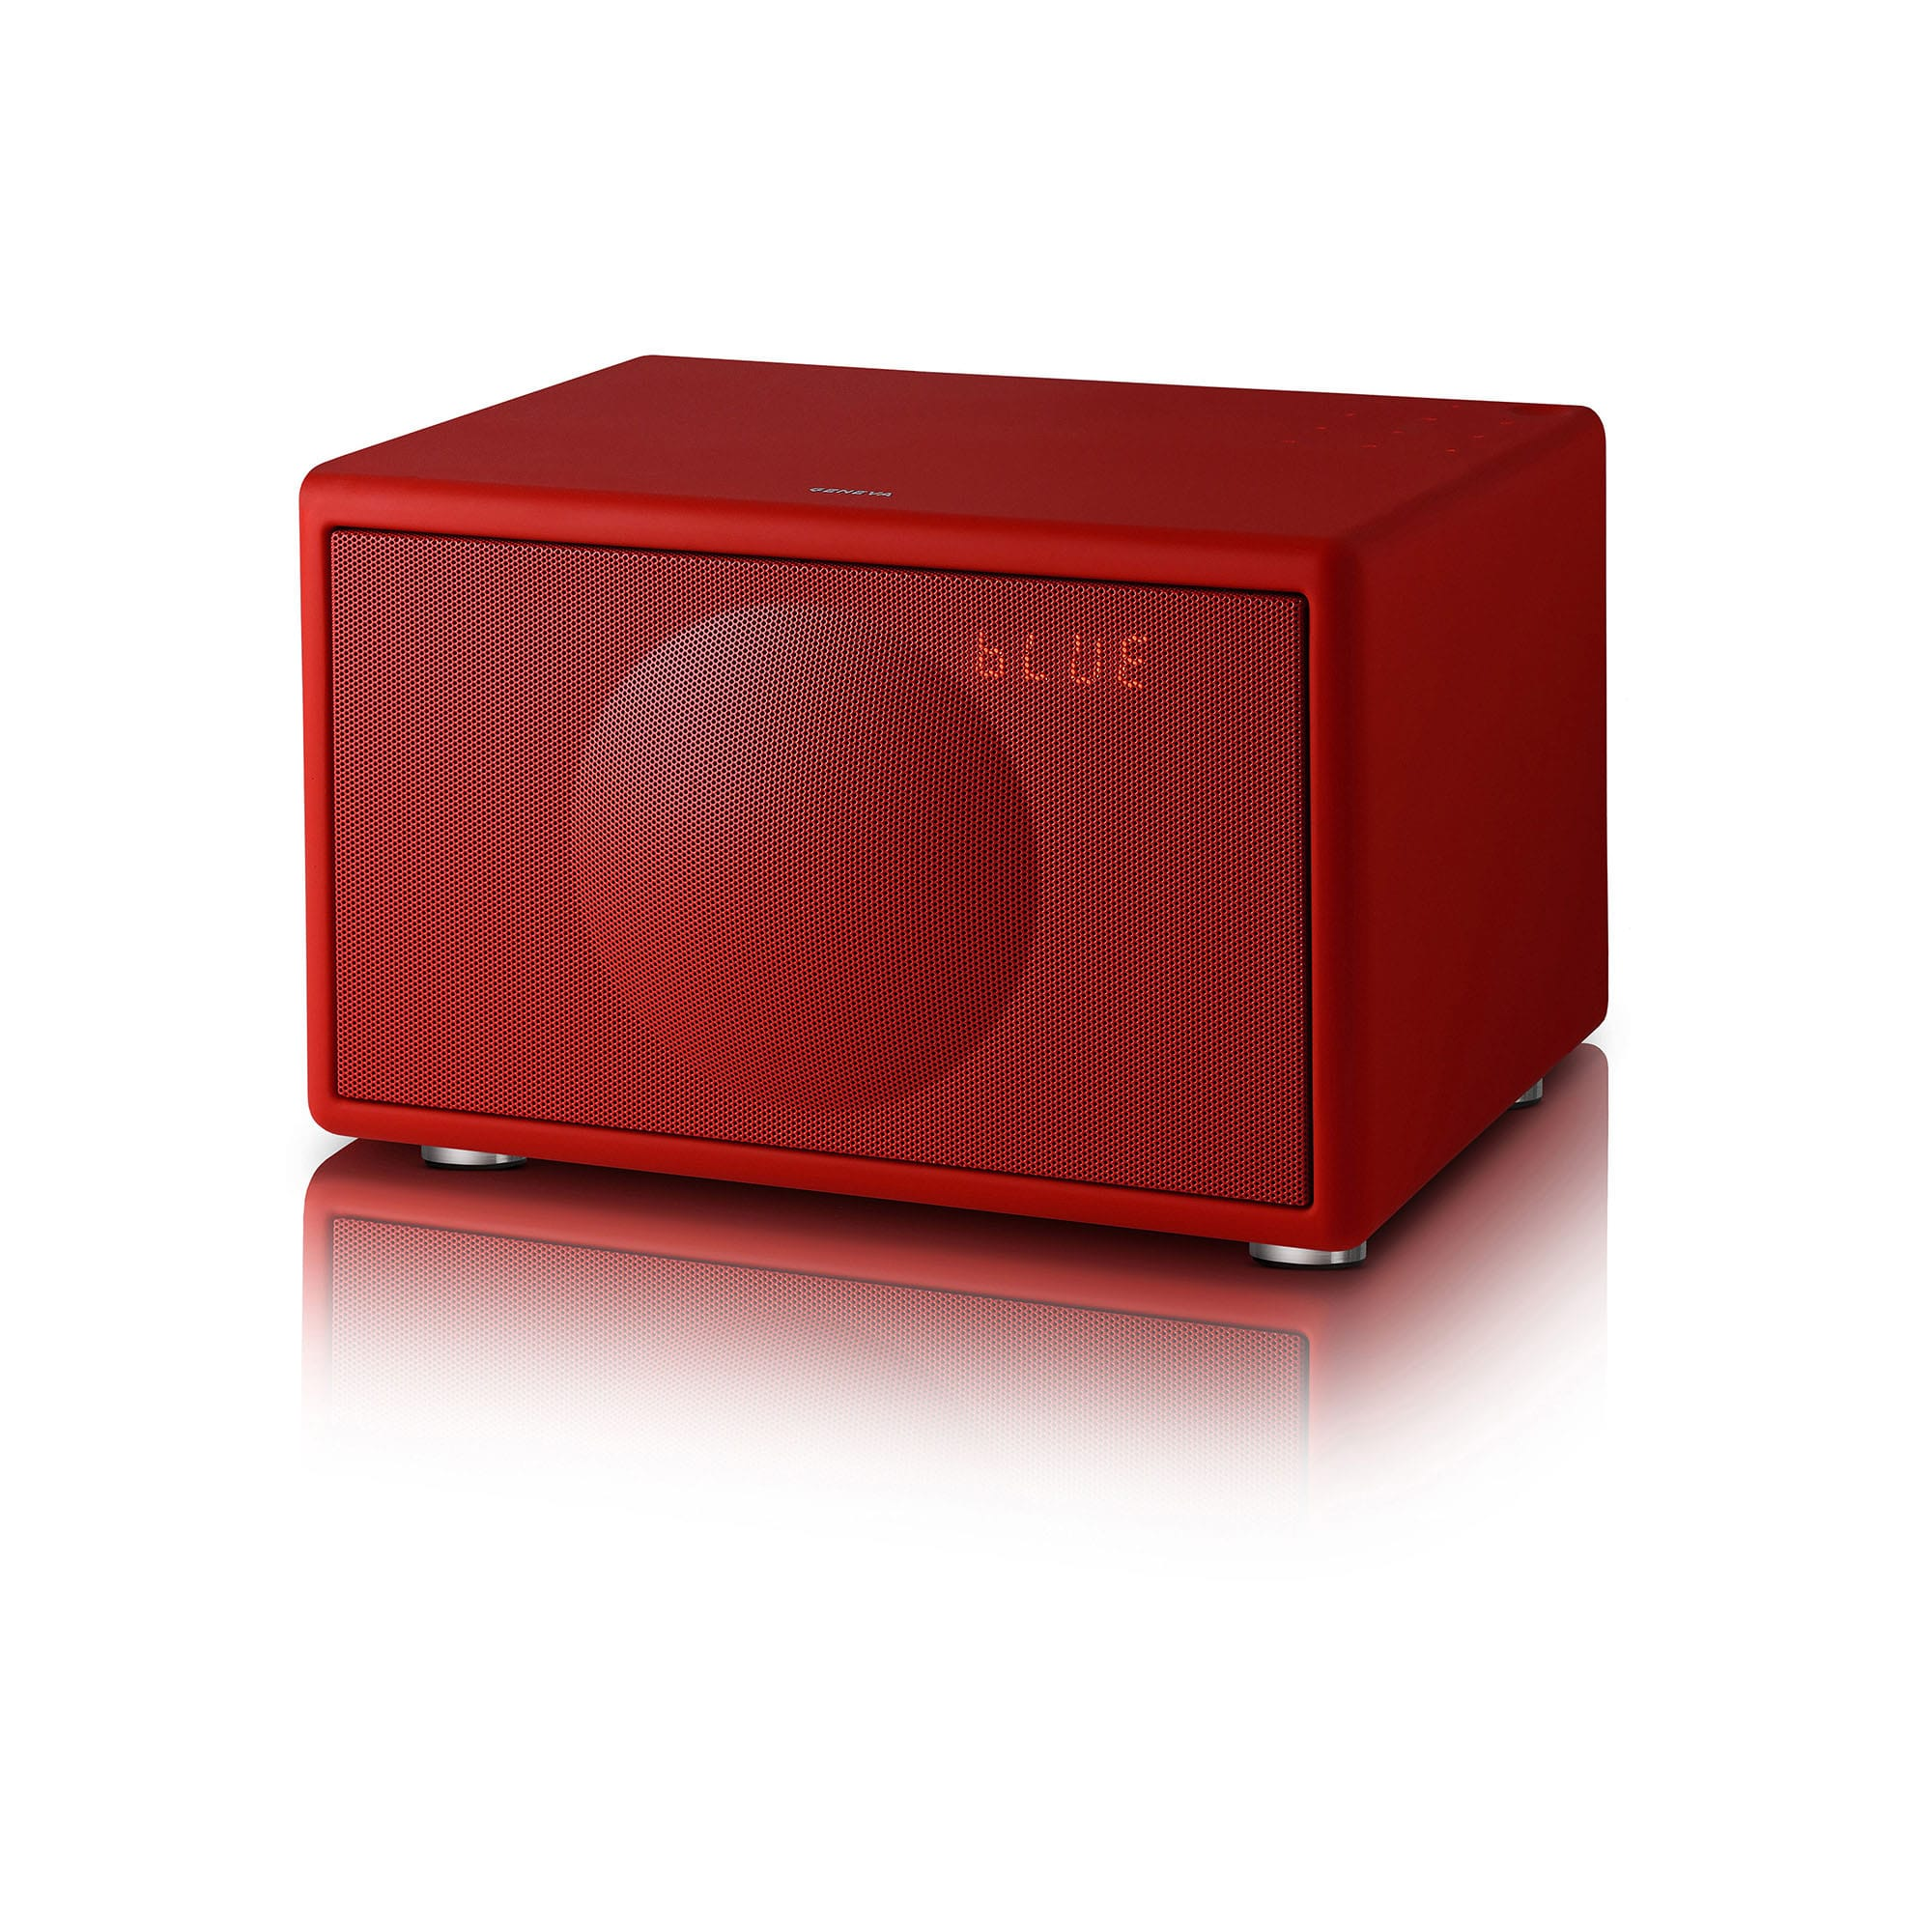 geneva model s dab bt matte red radiospesialisten. Black Bedroom Furniture Sets. Home Design Ideas